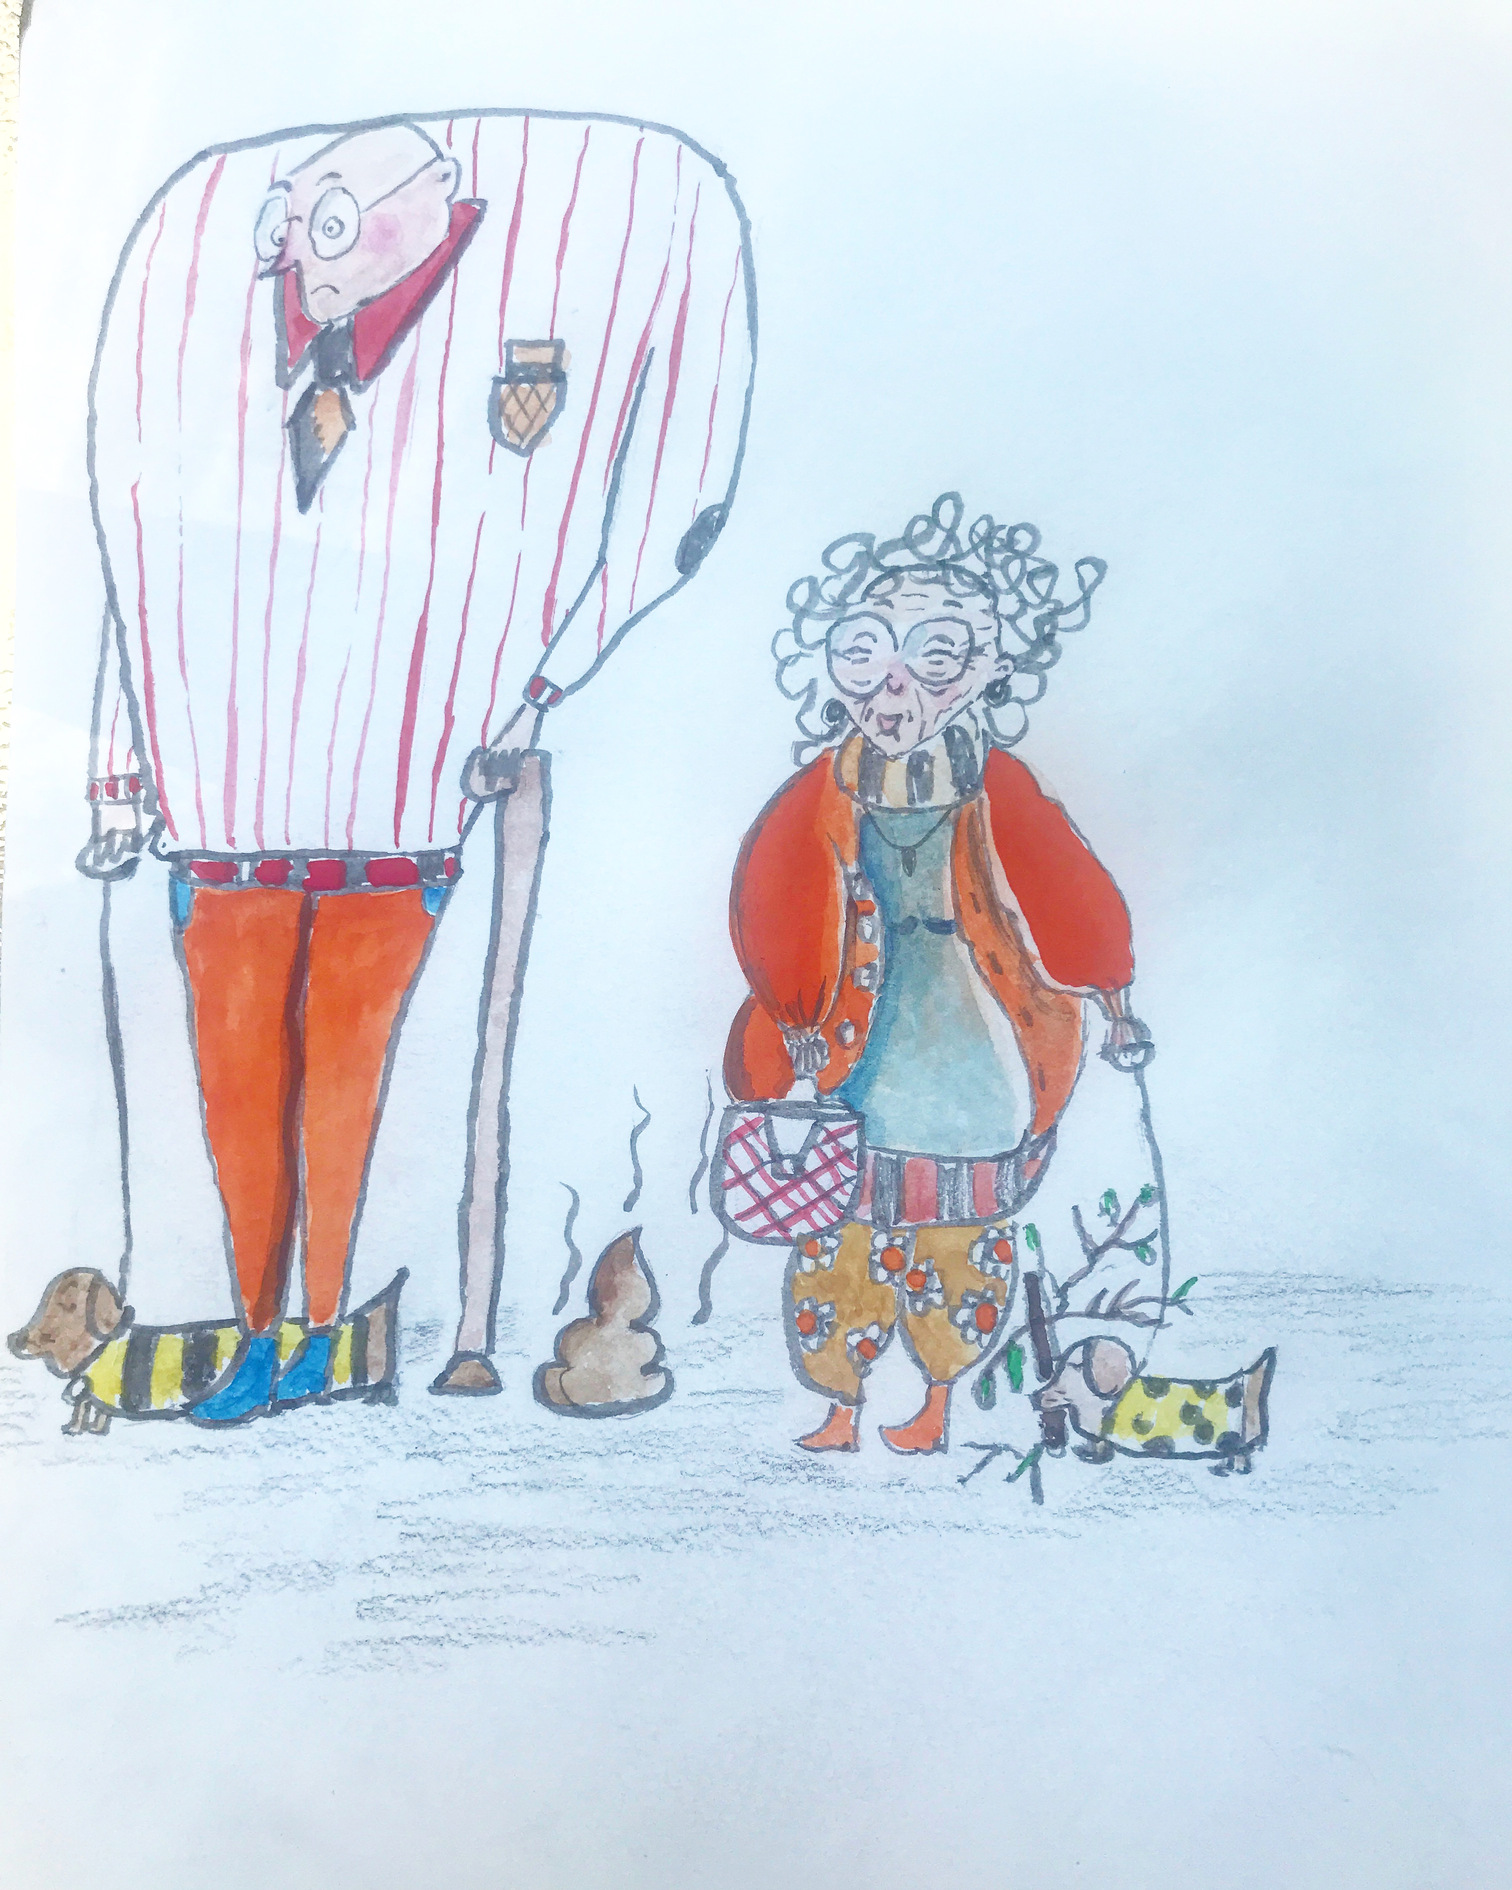 Rough illustrations of a cartoon elderly couple